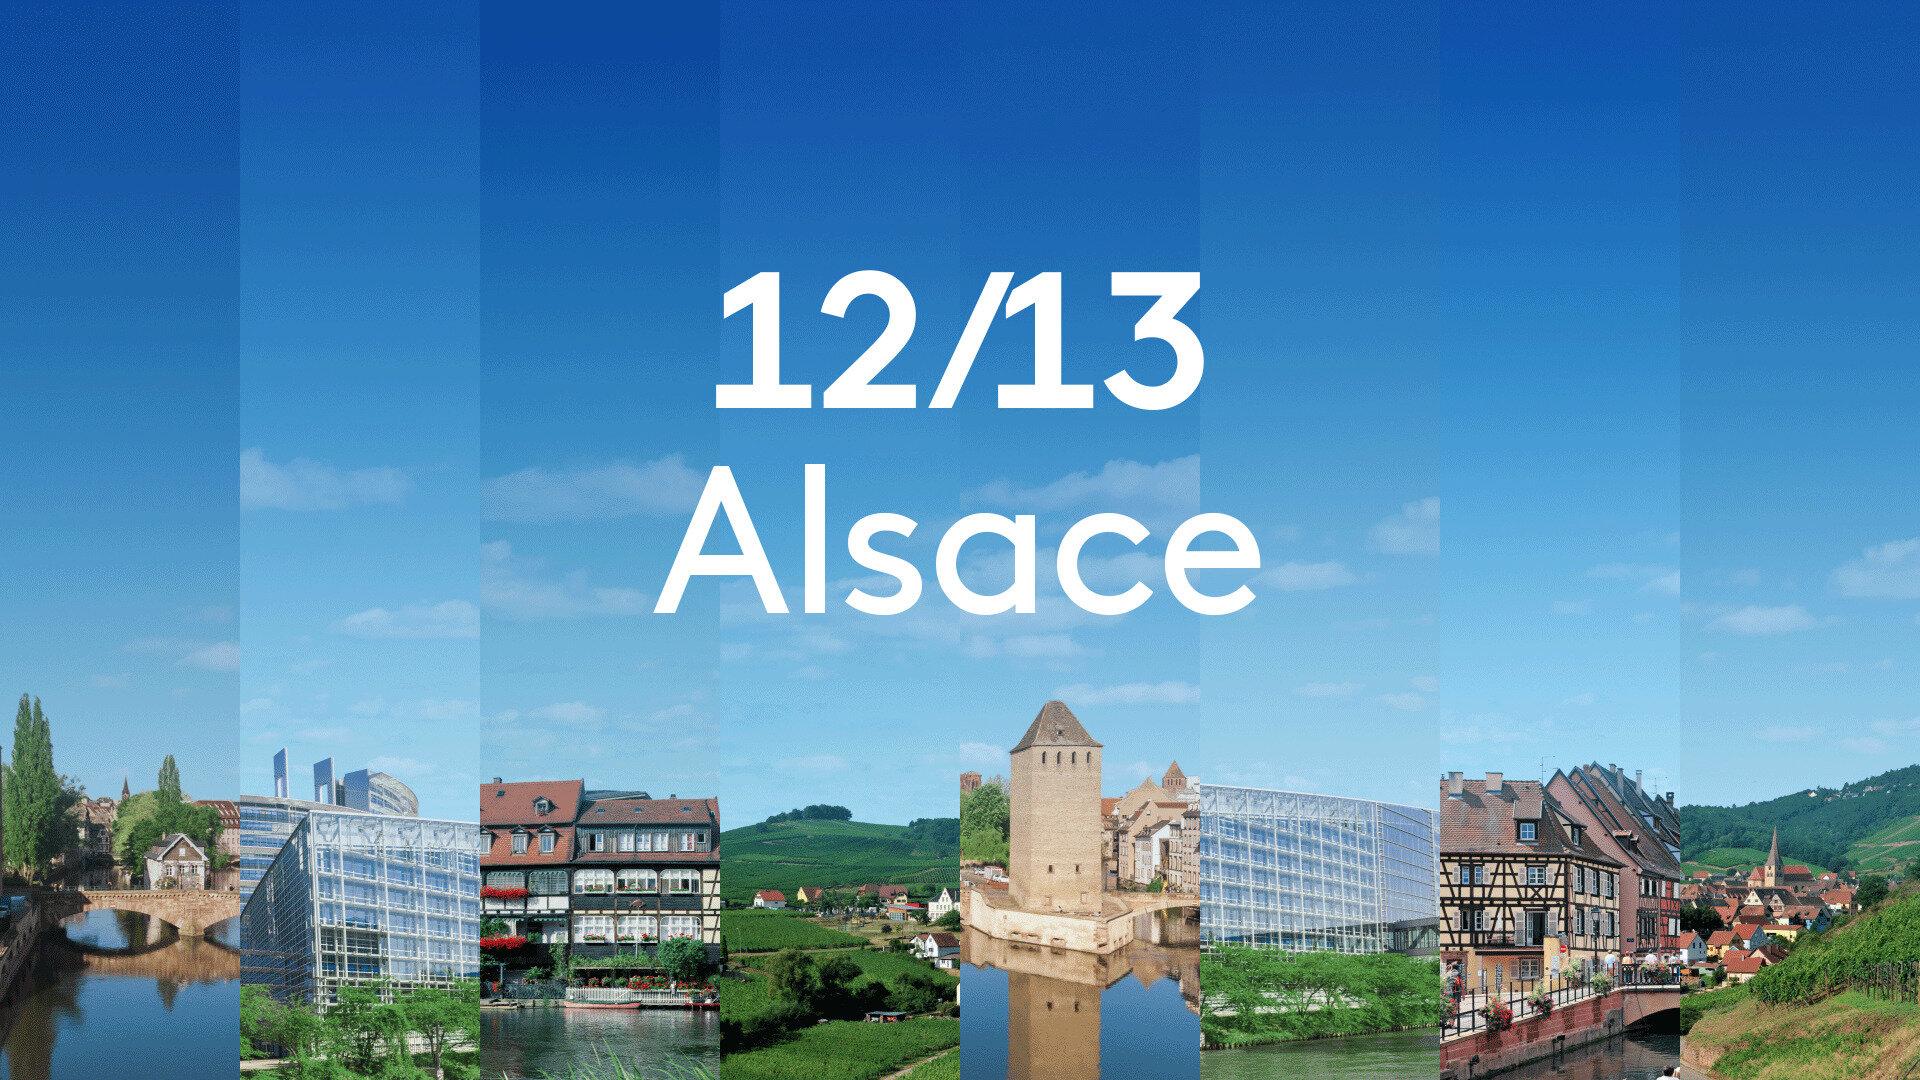 12/13 Alsace